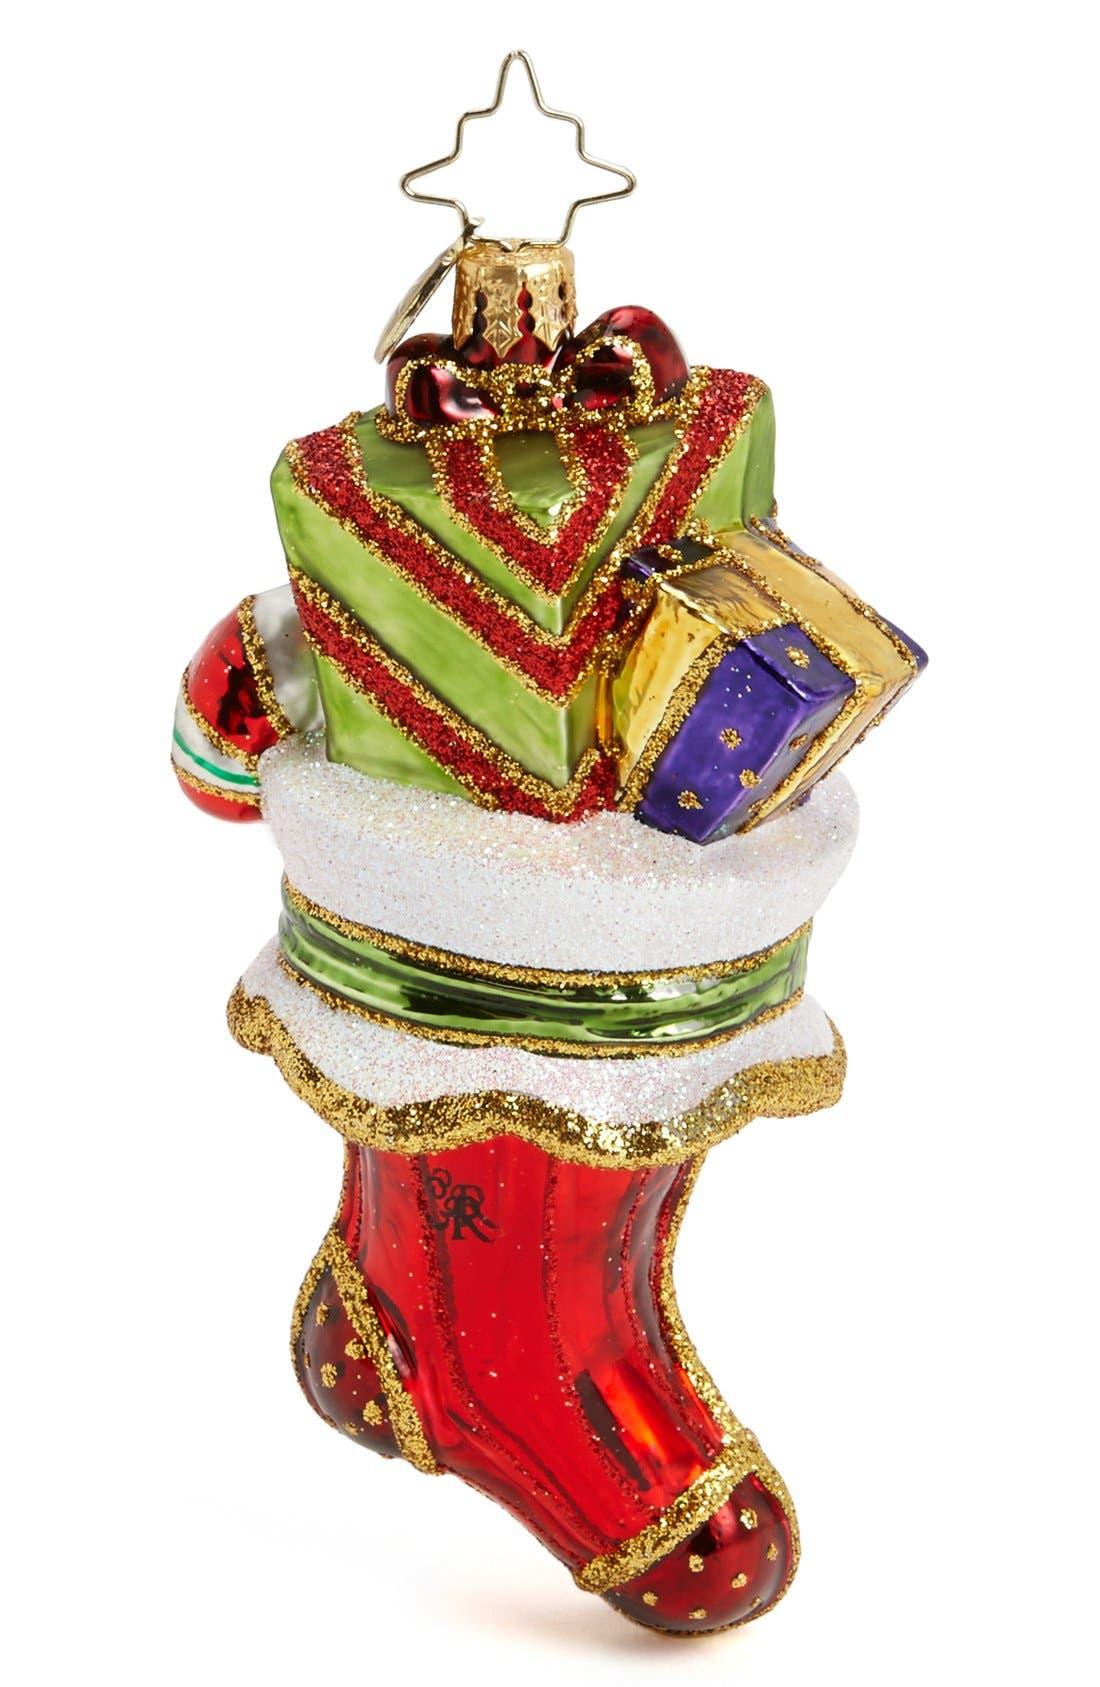 Alternate Image 1 Selected - Christopher Radko 'A Superb Stocking' Ornament